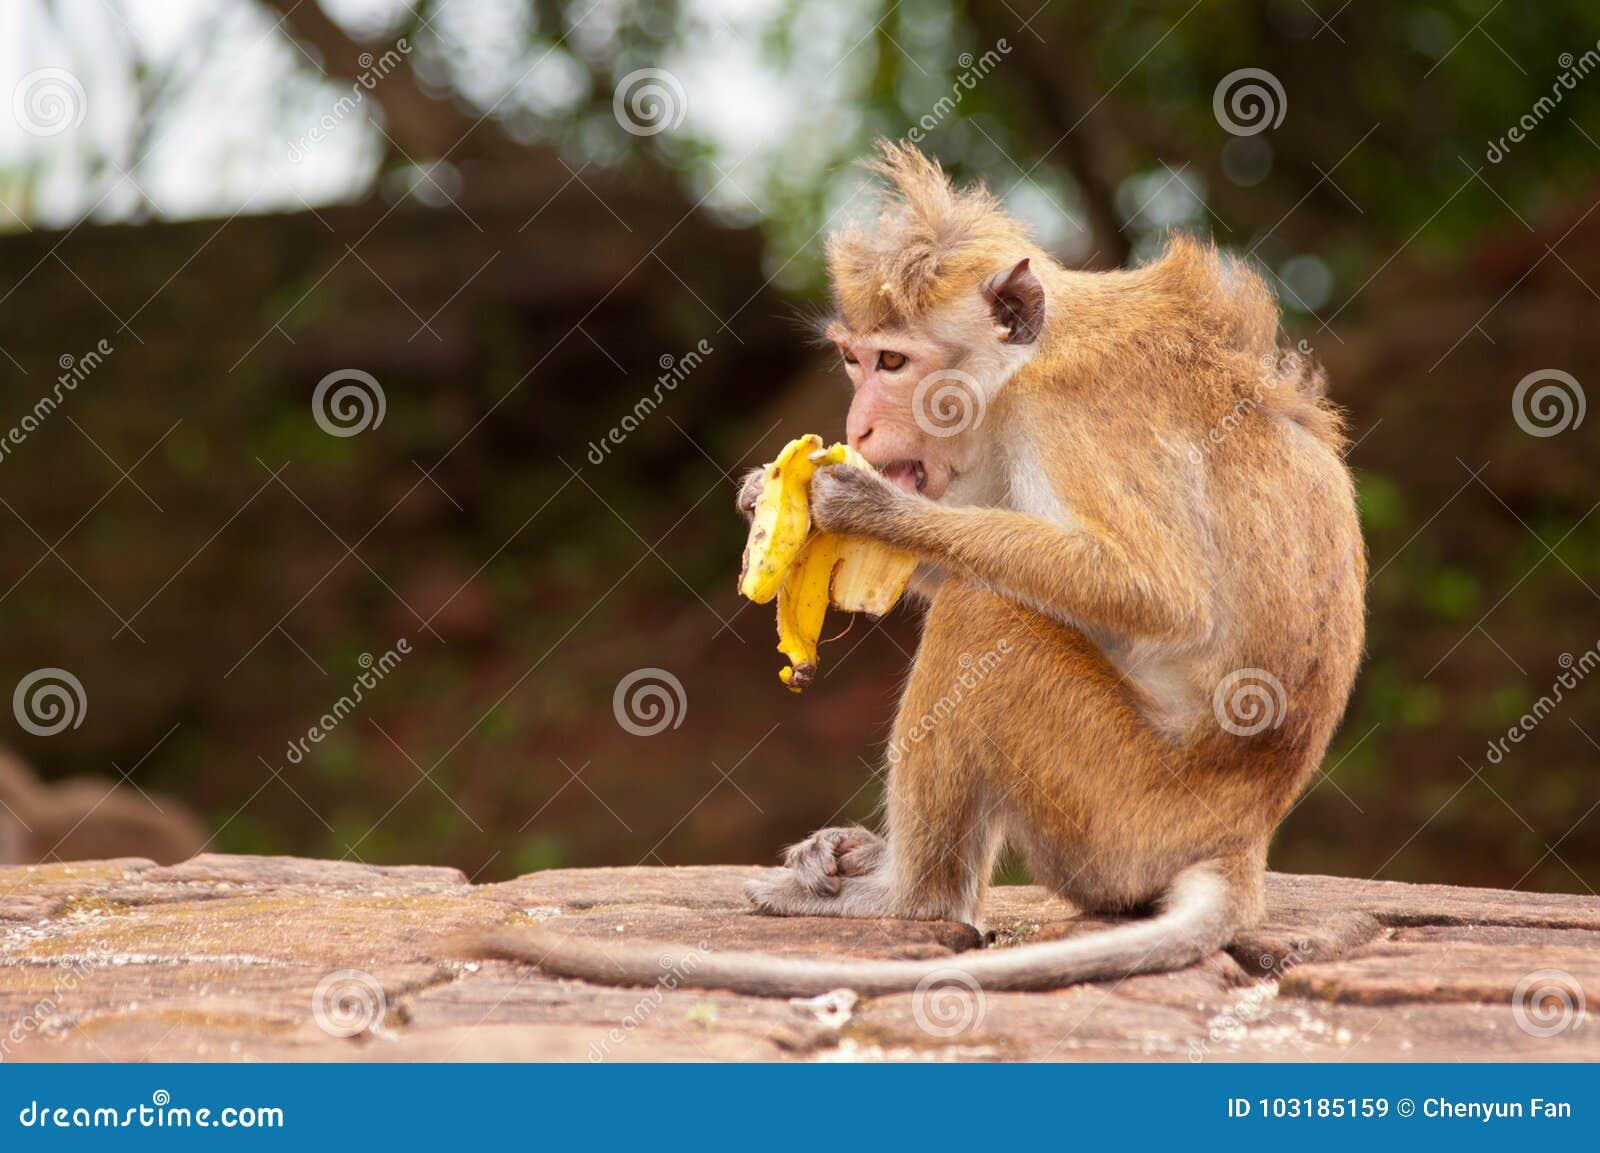 affe der banane isst stockbild bild von pelz macaque 103185159. Black Bedroom Furniture Sets. Home Design Ideas